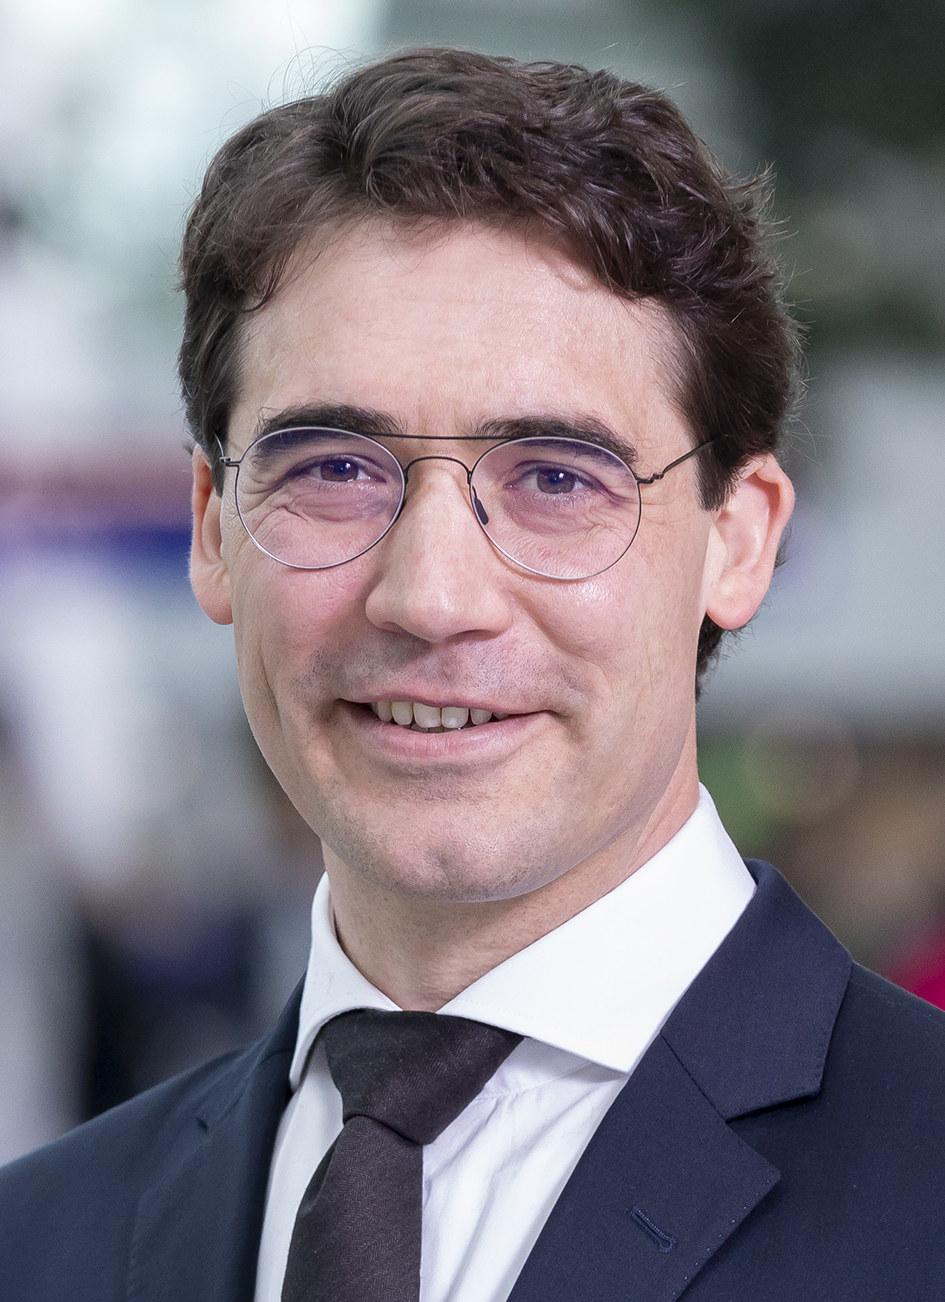 Lars Mosdorf, Flughafen Düsseldorf GmbH